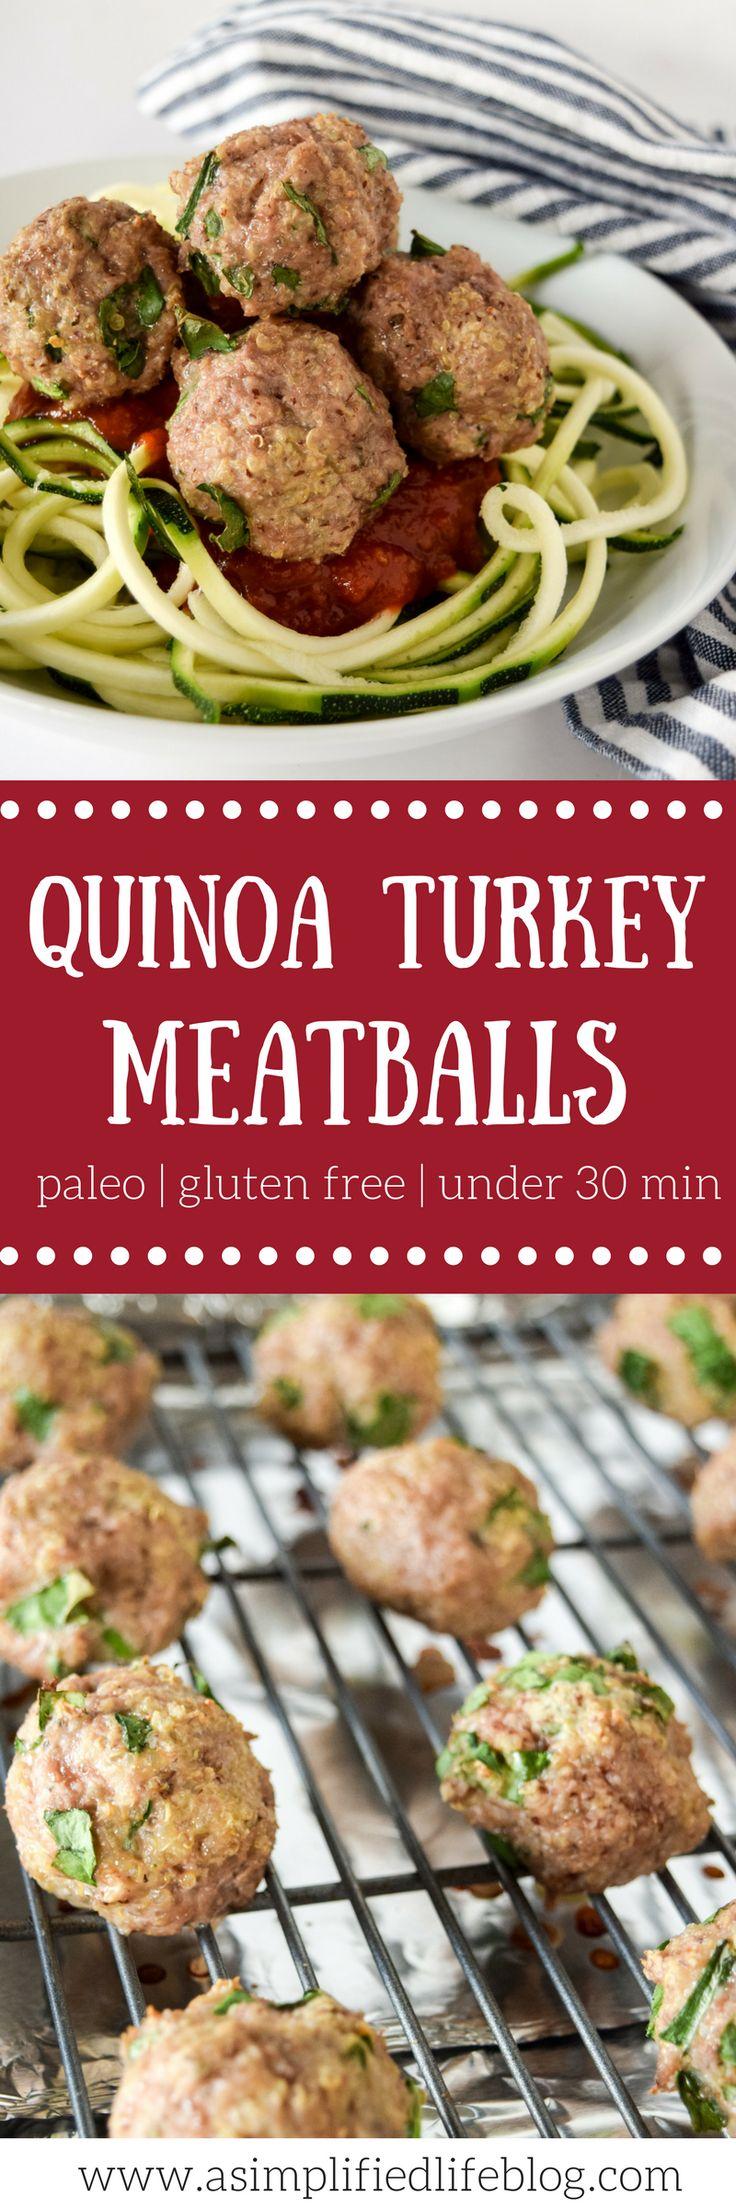 quinoa turkey meatballs | healthy dinner recipes | turkey meatballs | turkey meatballs paleo | turkey meatballs easy | turkey meatballs baked | turkey meatballs recipe | easy paleo dinner | paleo dinner recipes | gluten free meatballs | healthy meatballs